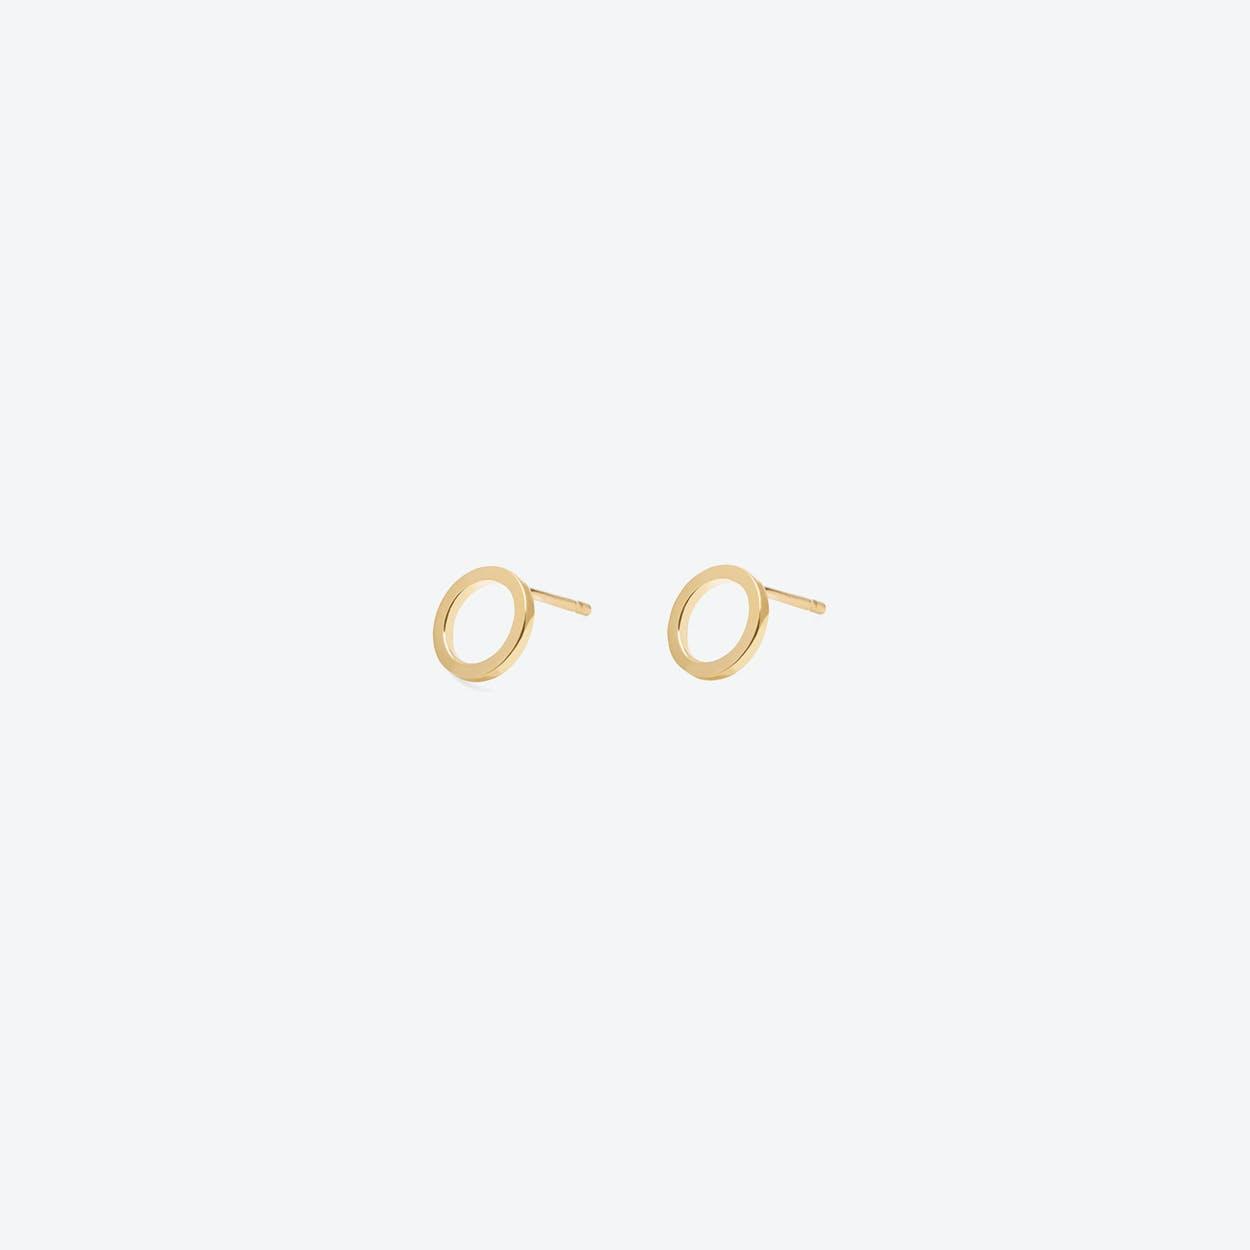 Mini Circle Square Earrings Gold Plated